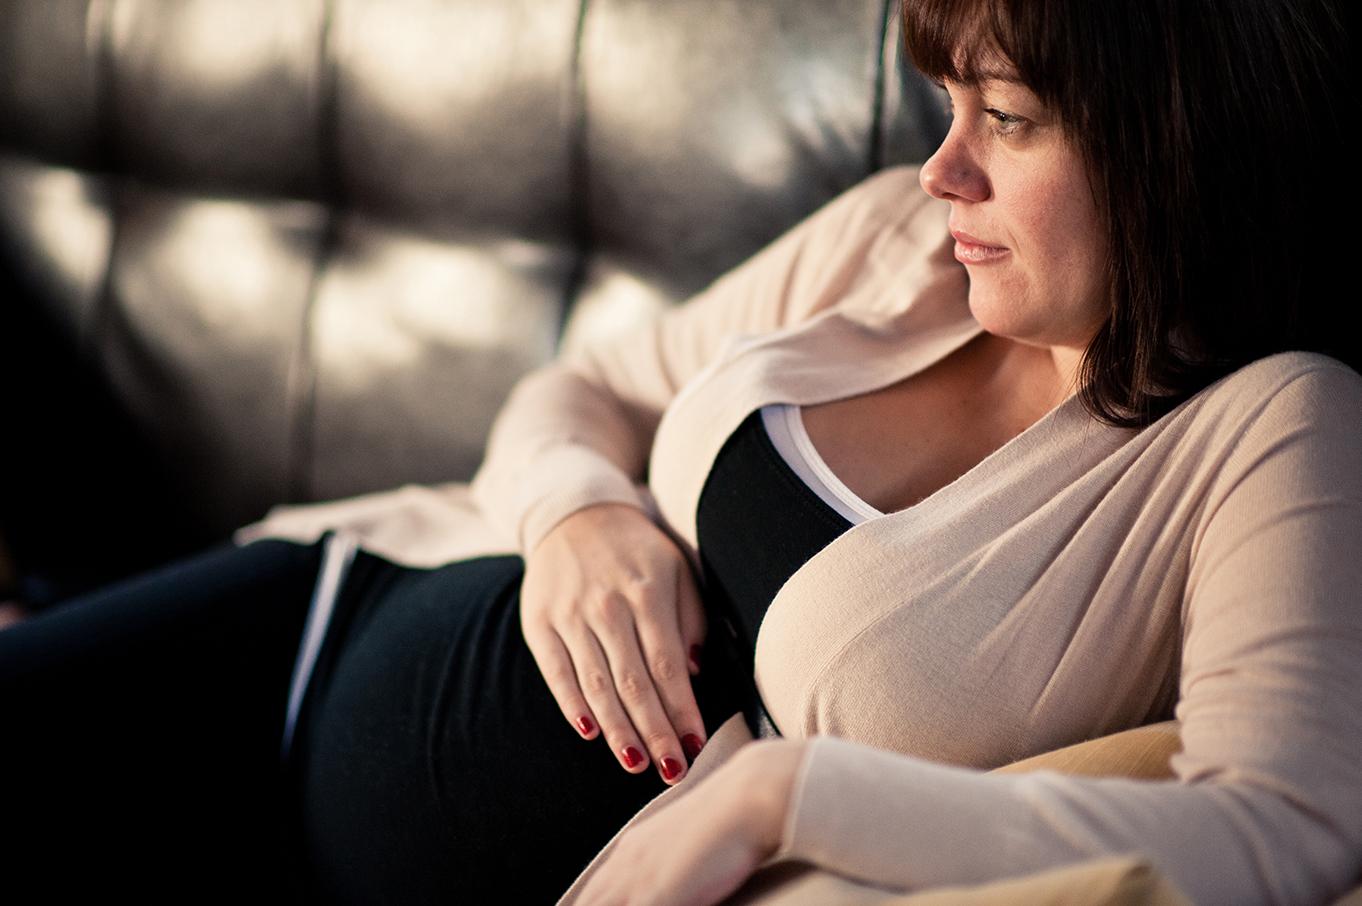 JWilson_Maternity-25.jpg